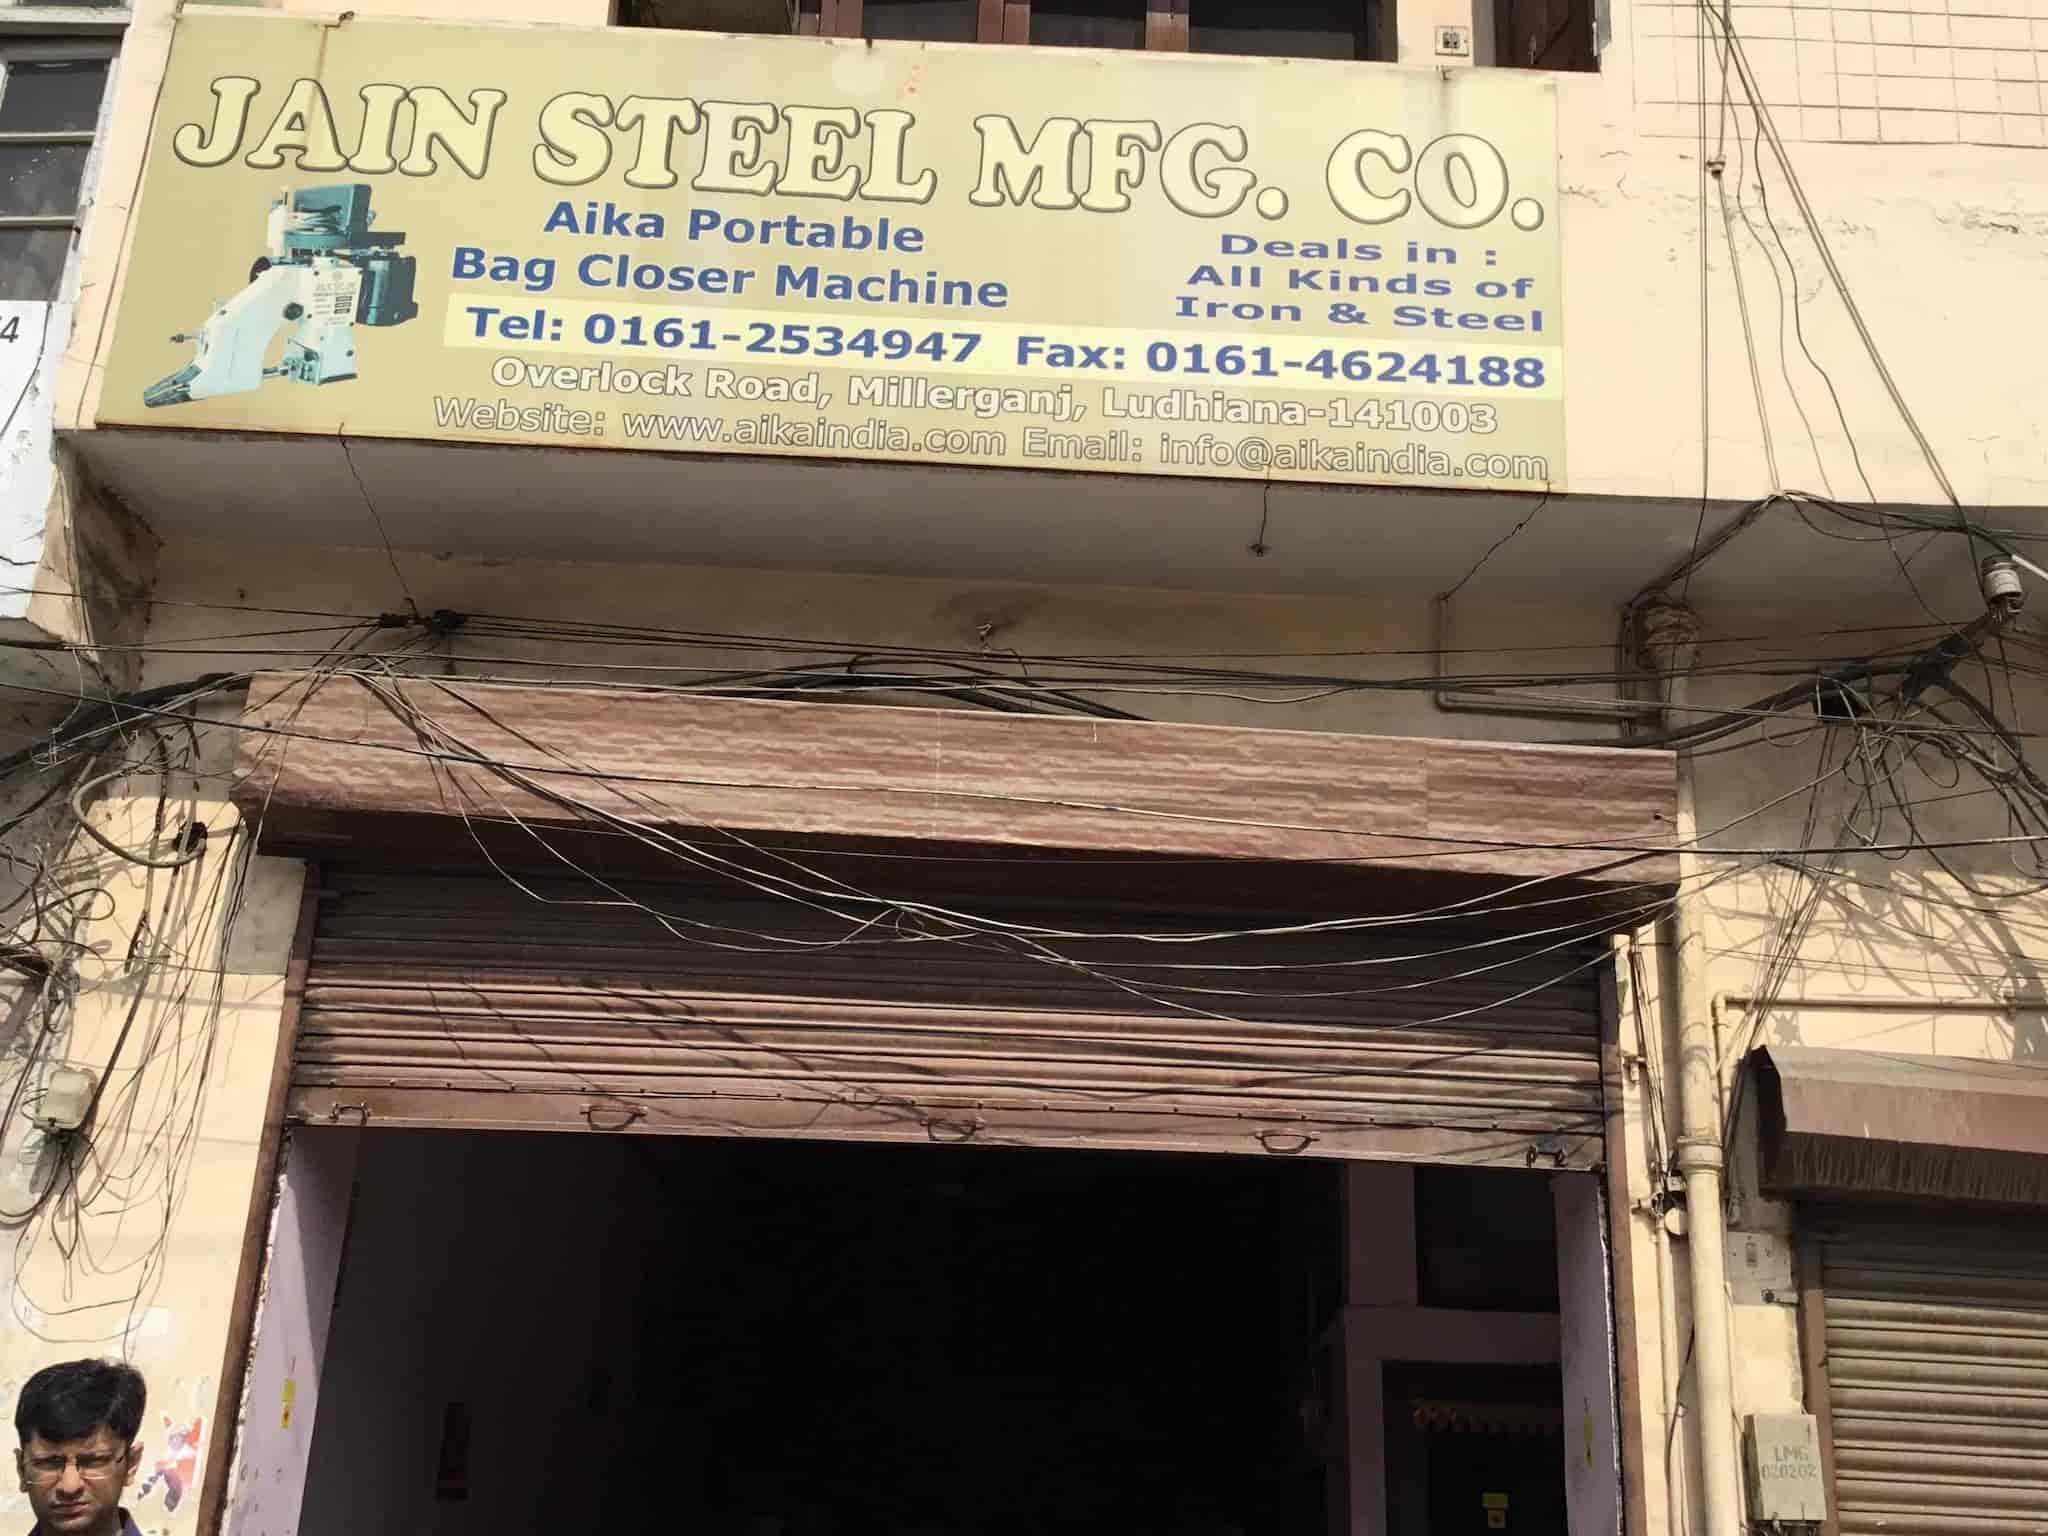 Jain Steel Manufacturing Company, Millerganj - Sewing Machine